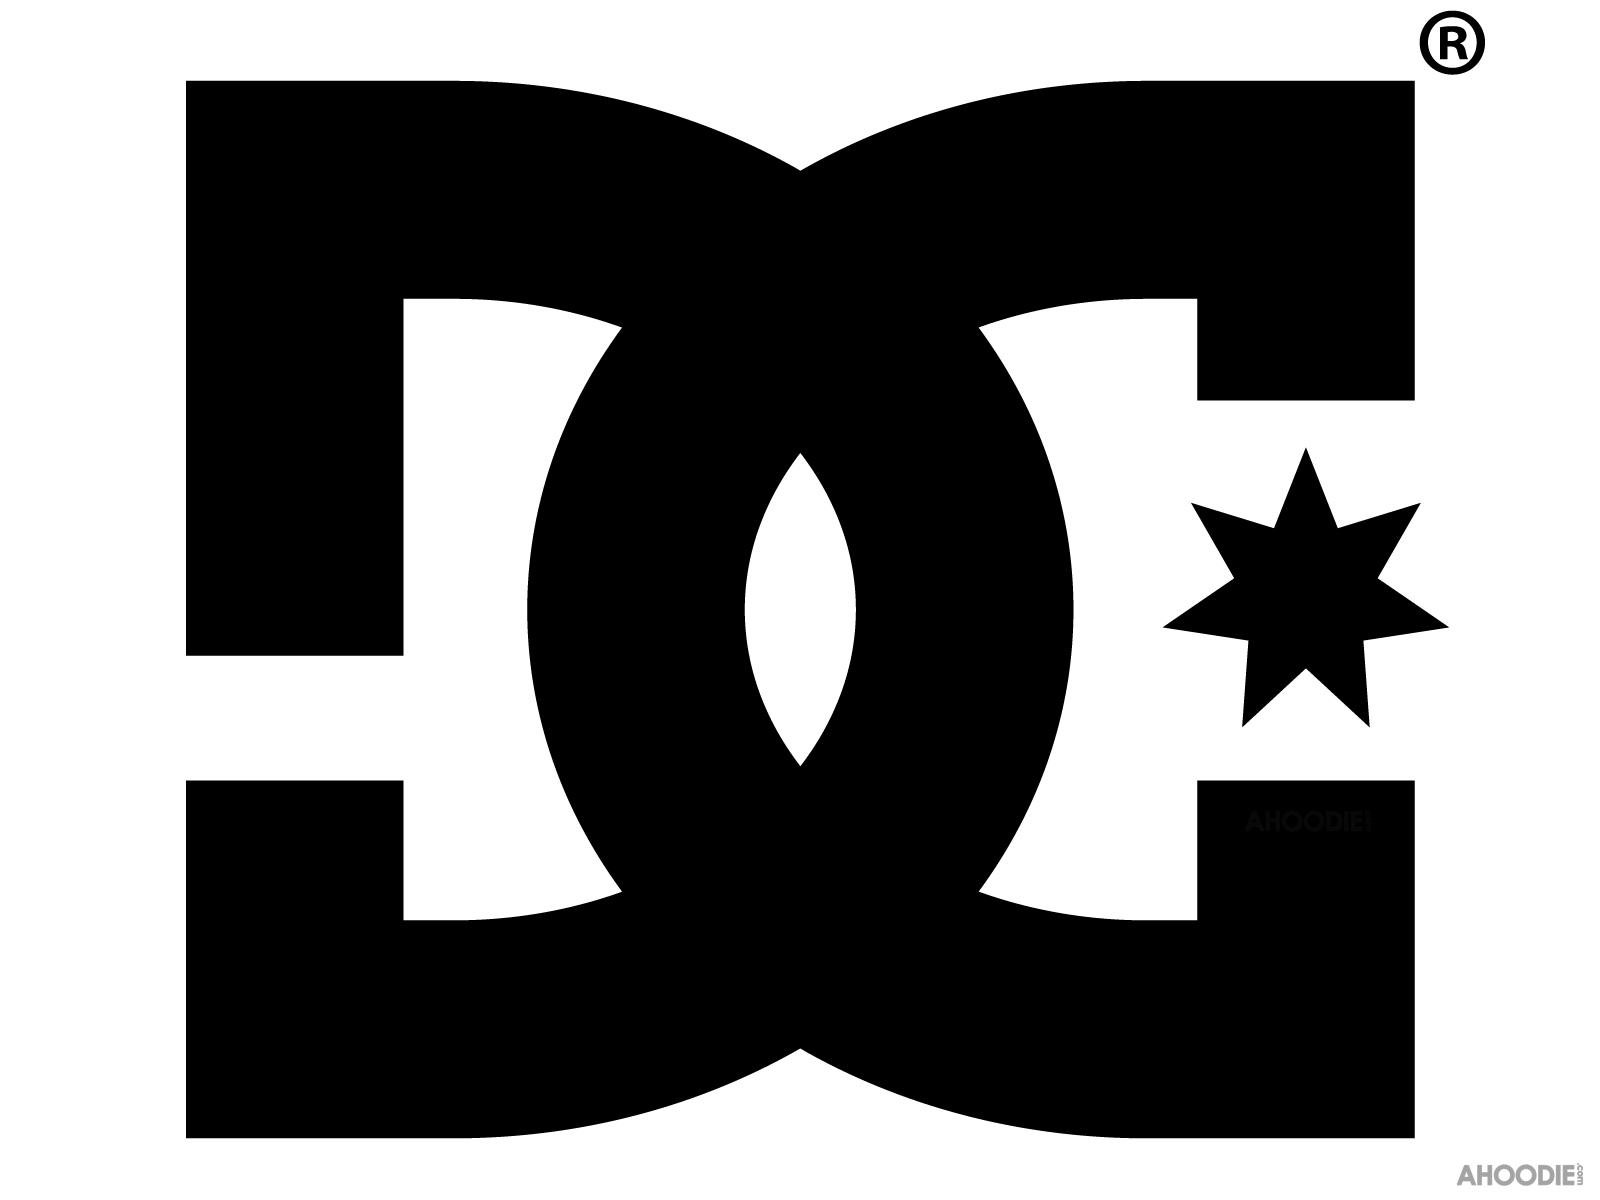 wallpaper Wallpapers Dc Shoes Logo 1600x1200